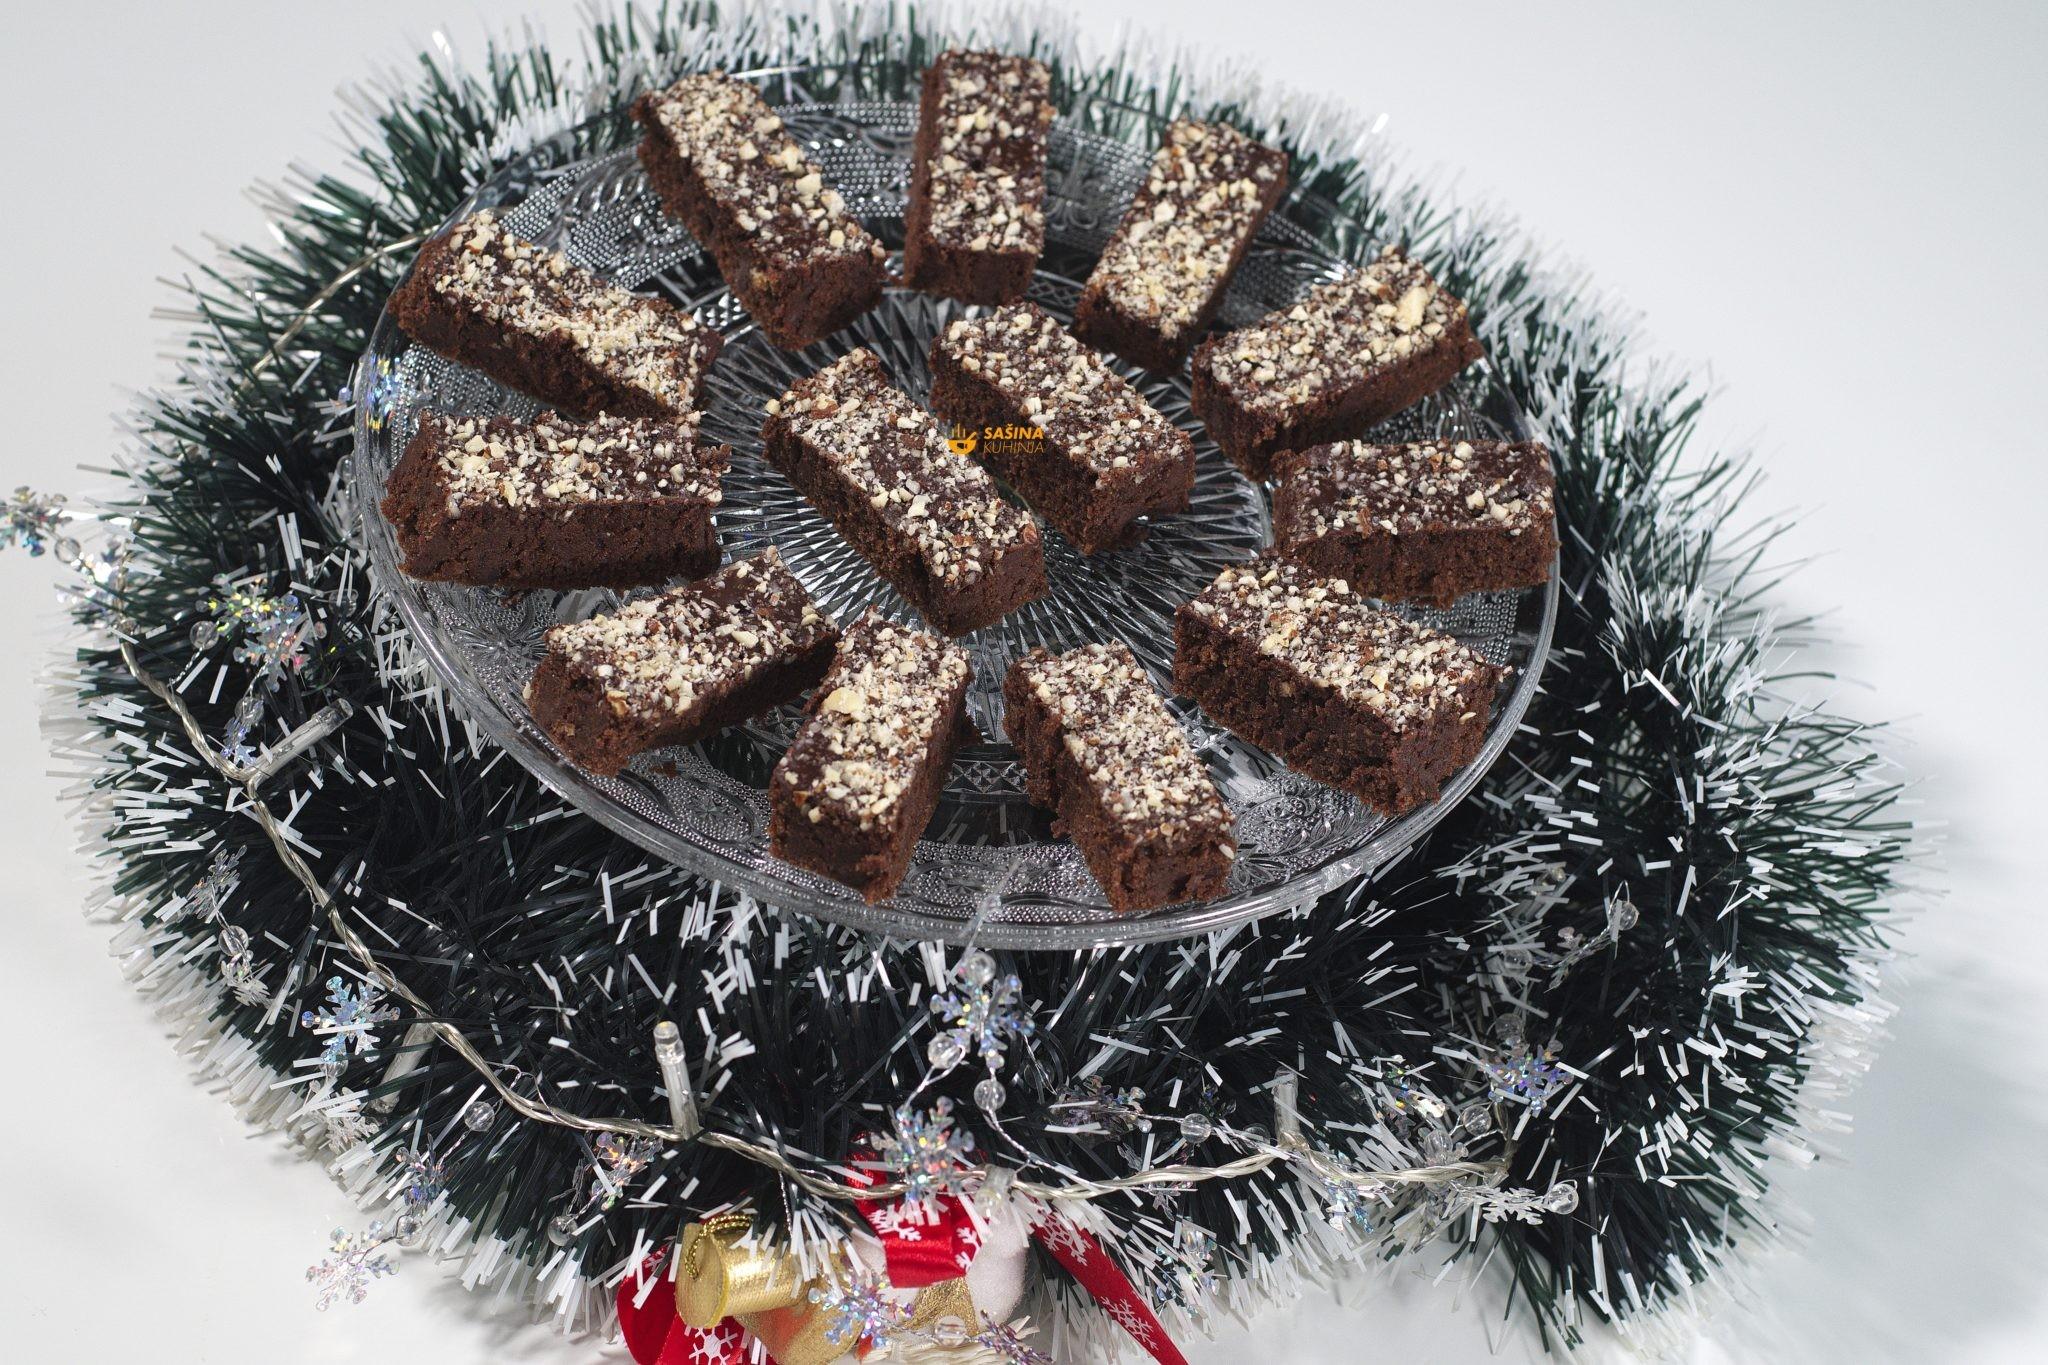 čokoladni zalogajčići